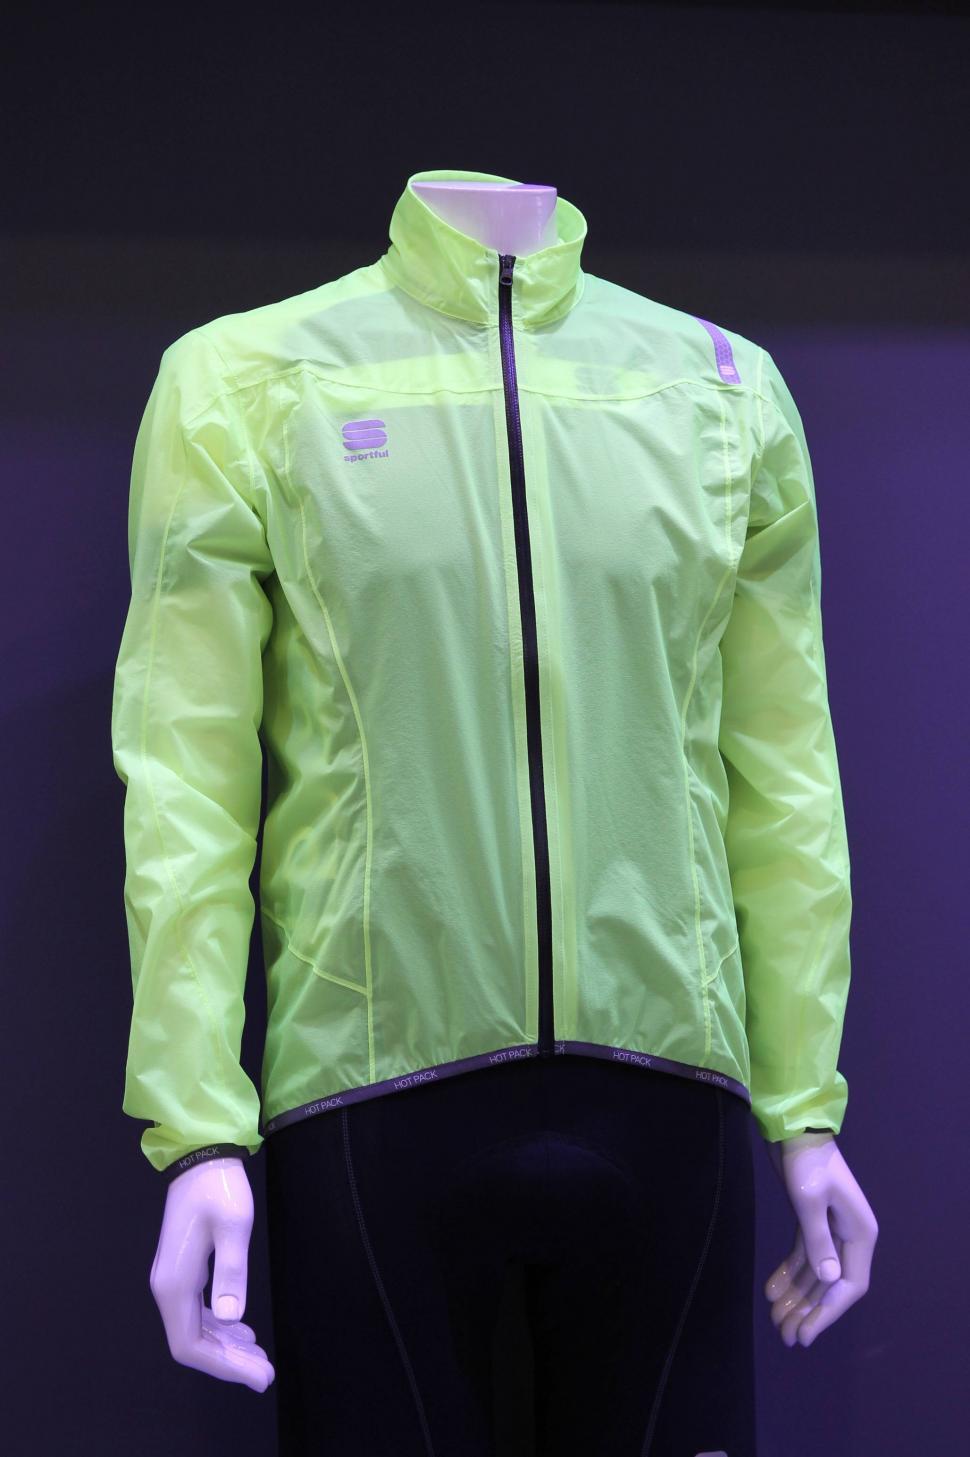 Sportful 2017 clothing - 23.jpg